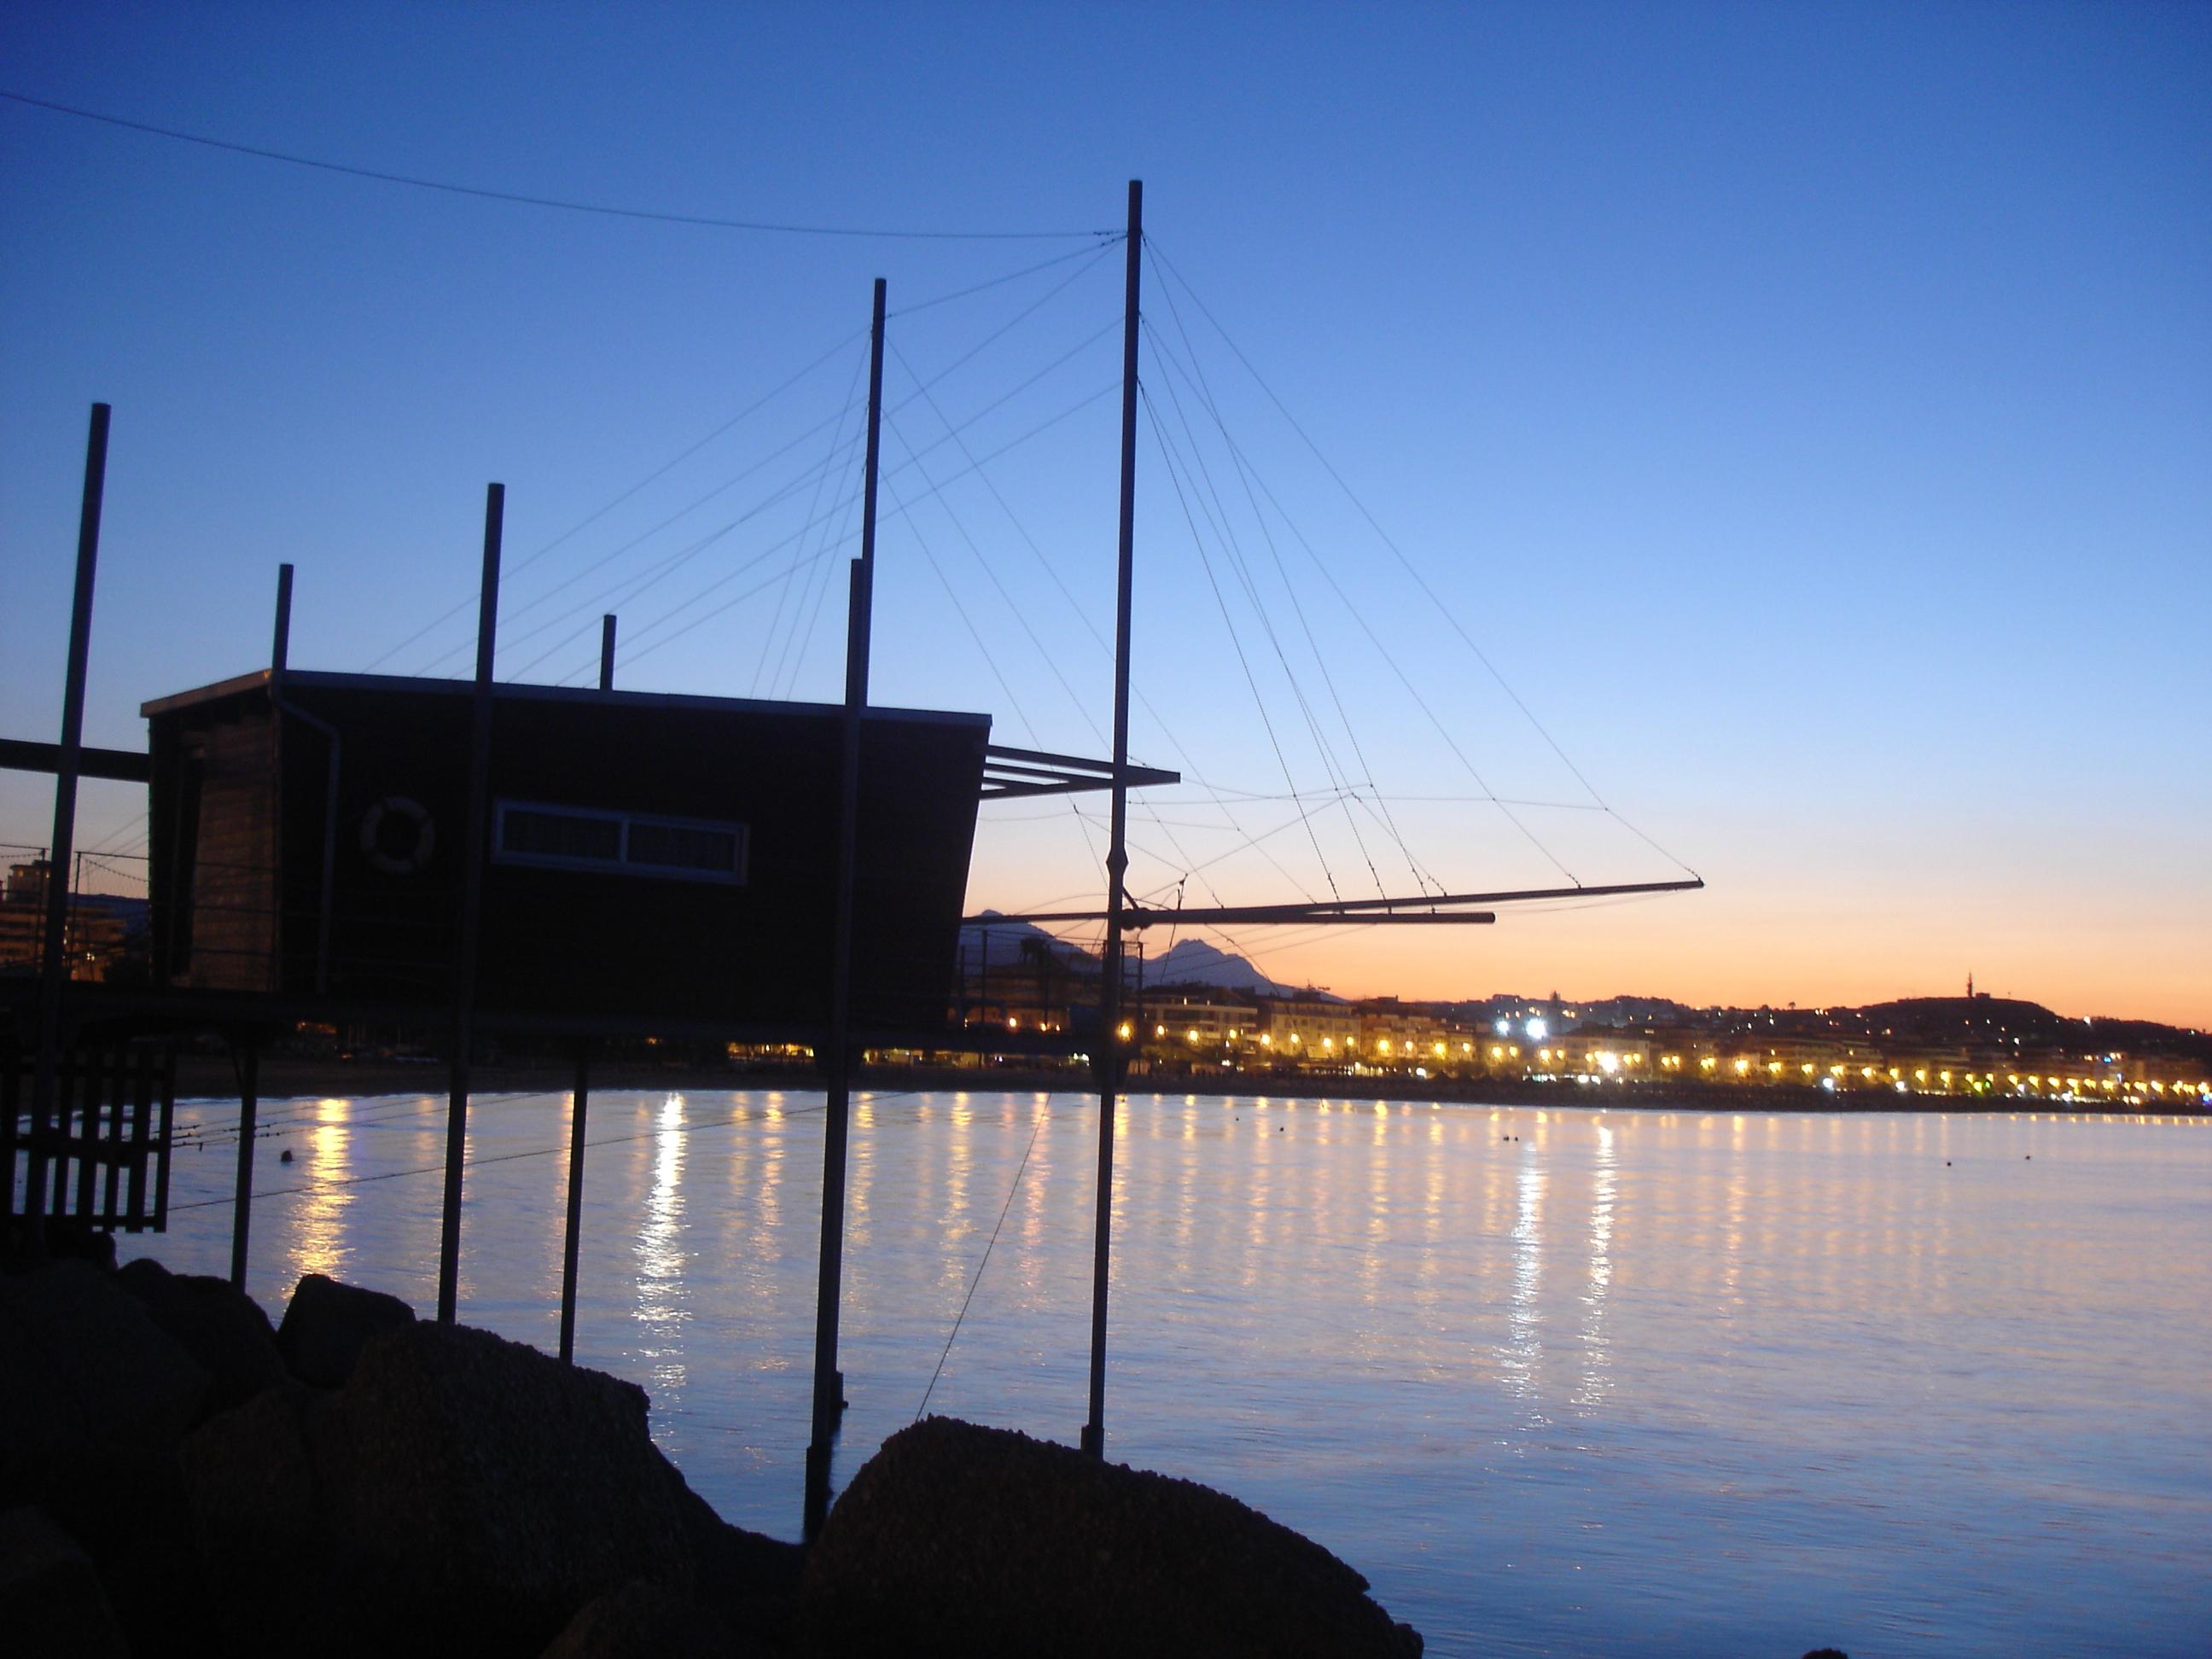 The City at sunset - Pescara - Visit Italy